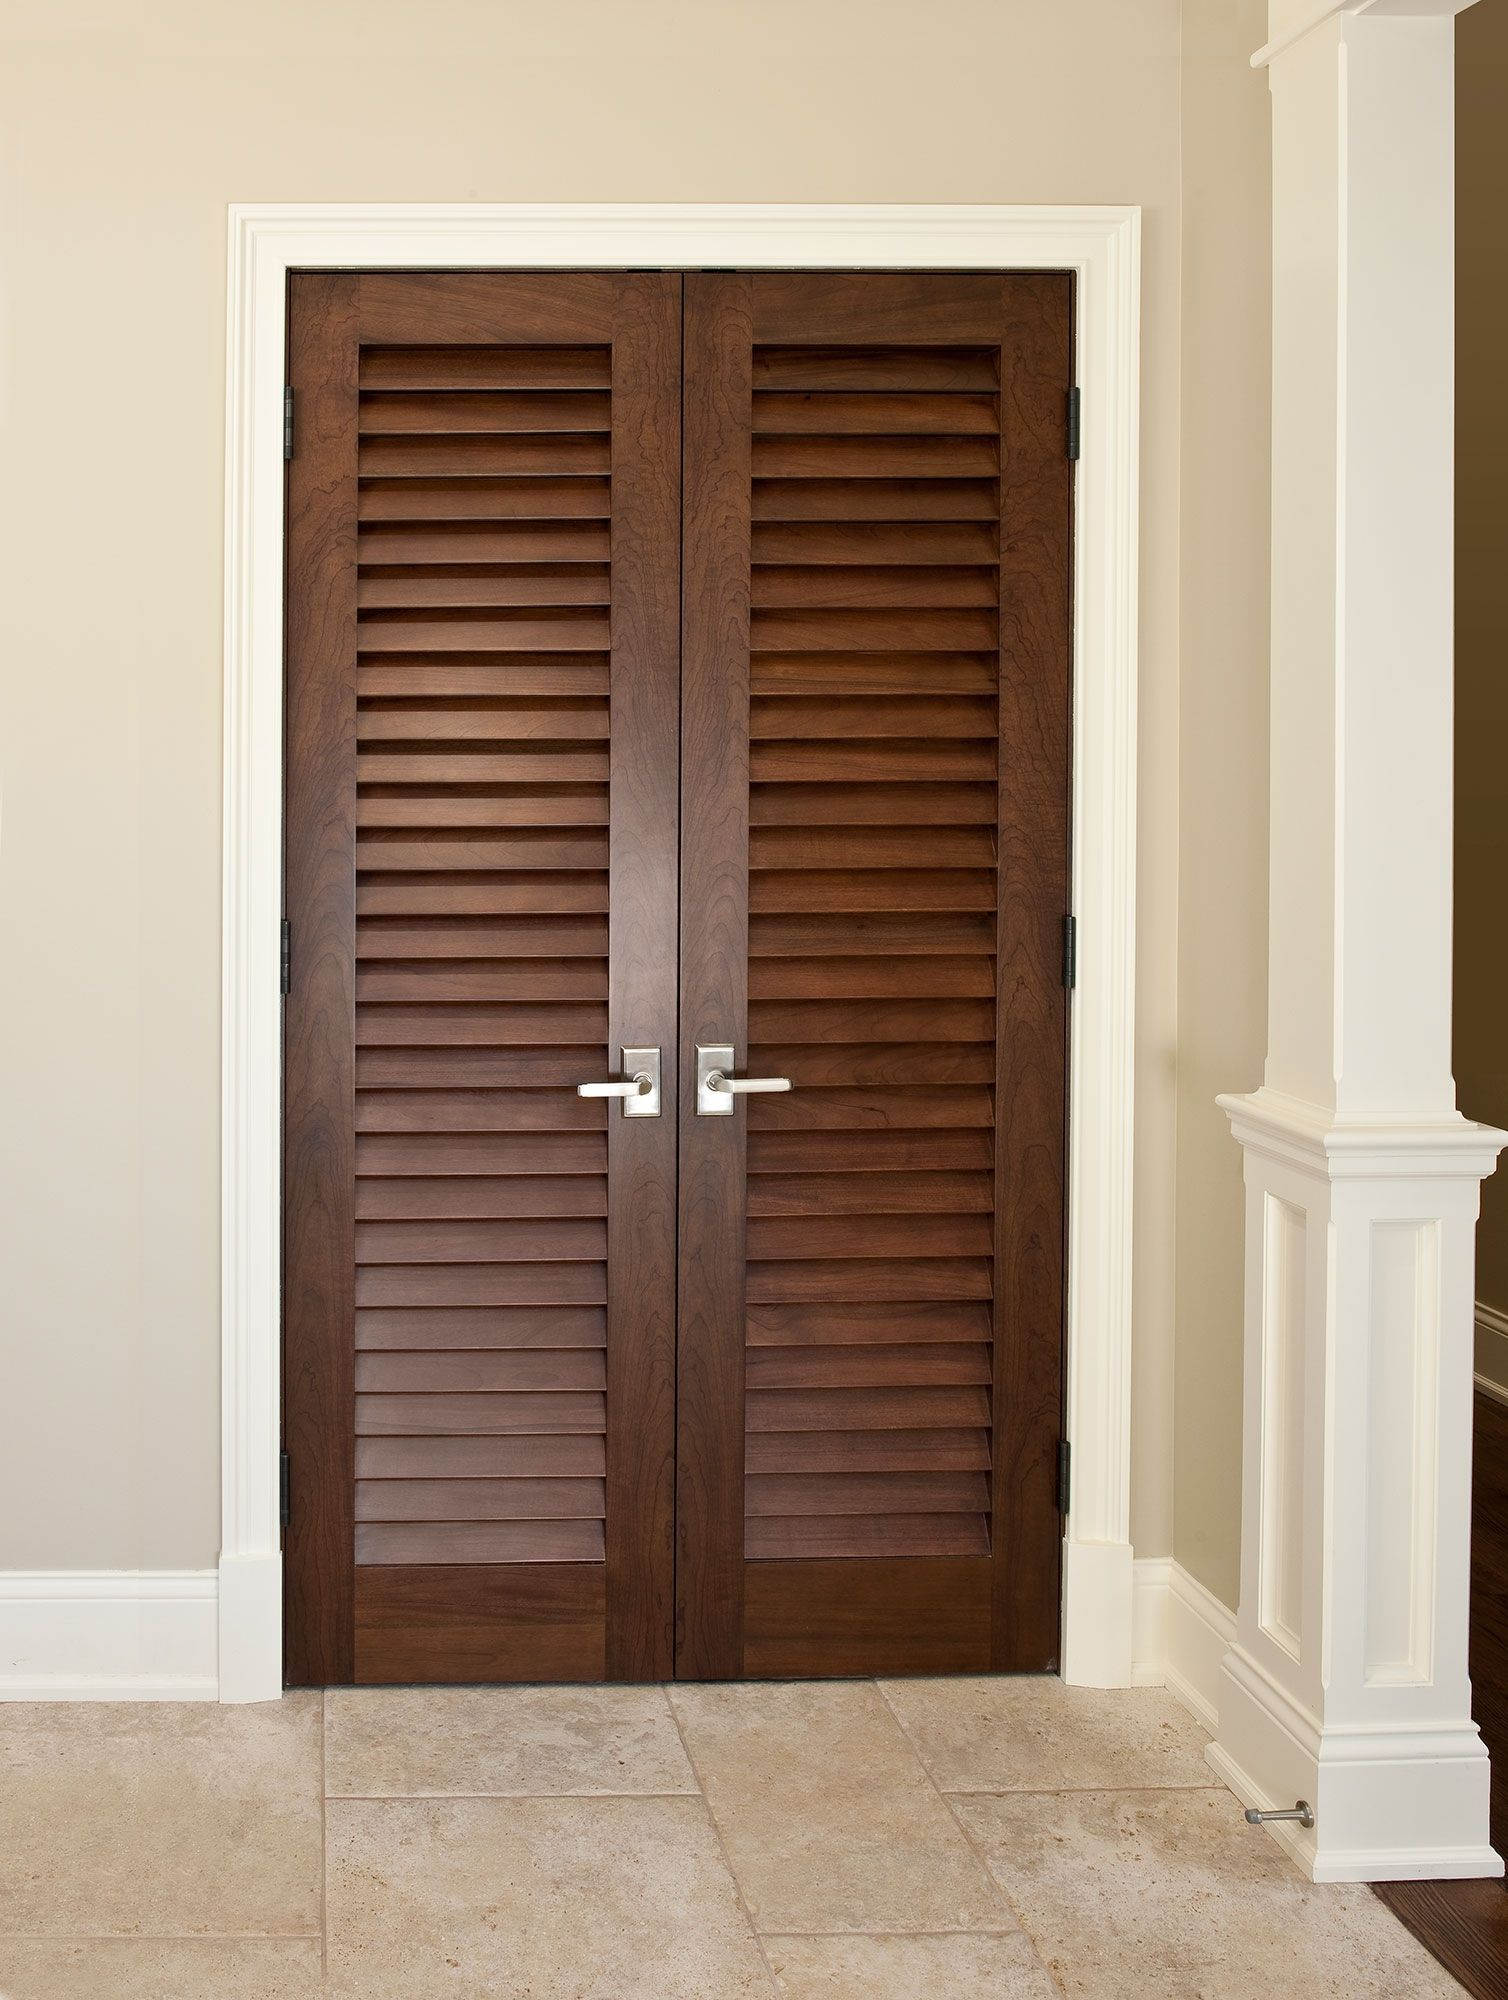 Custom bifold louvered closet doors barn doors not just for barns